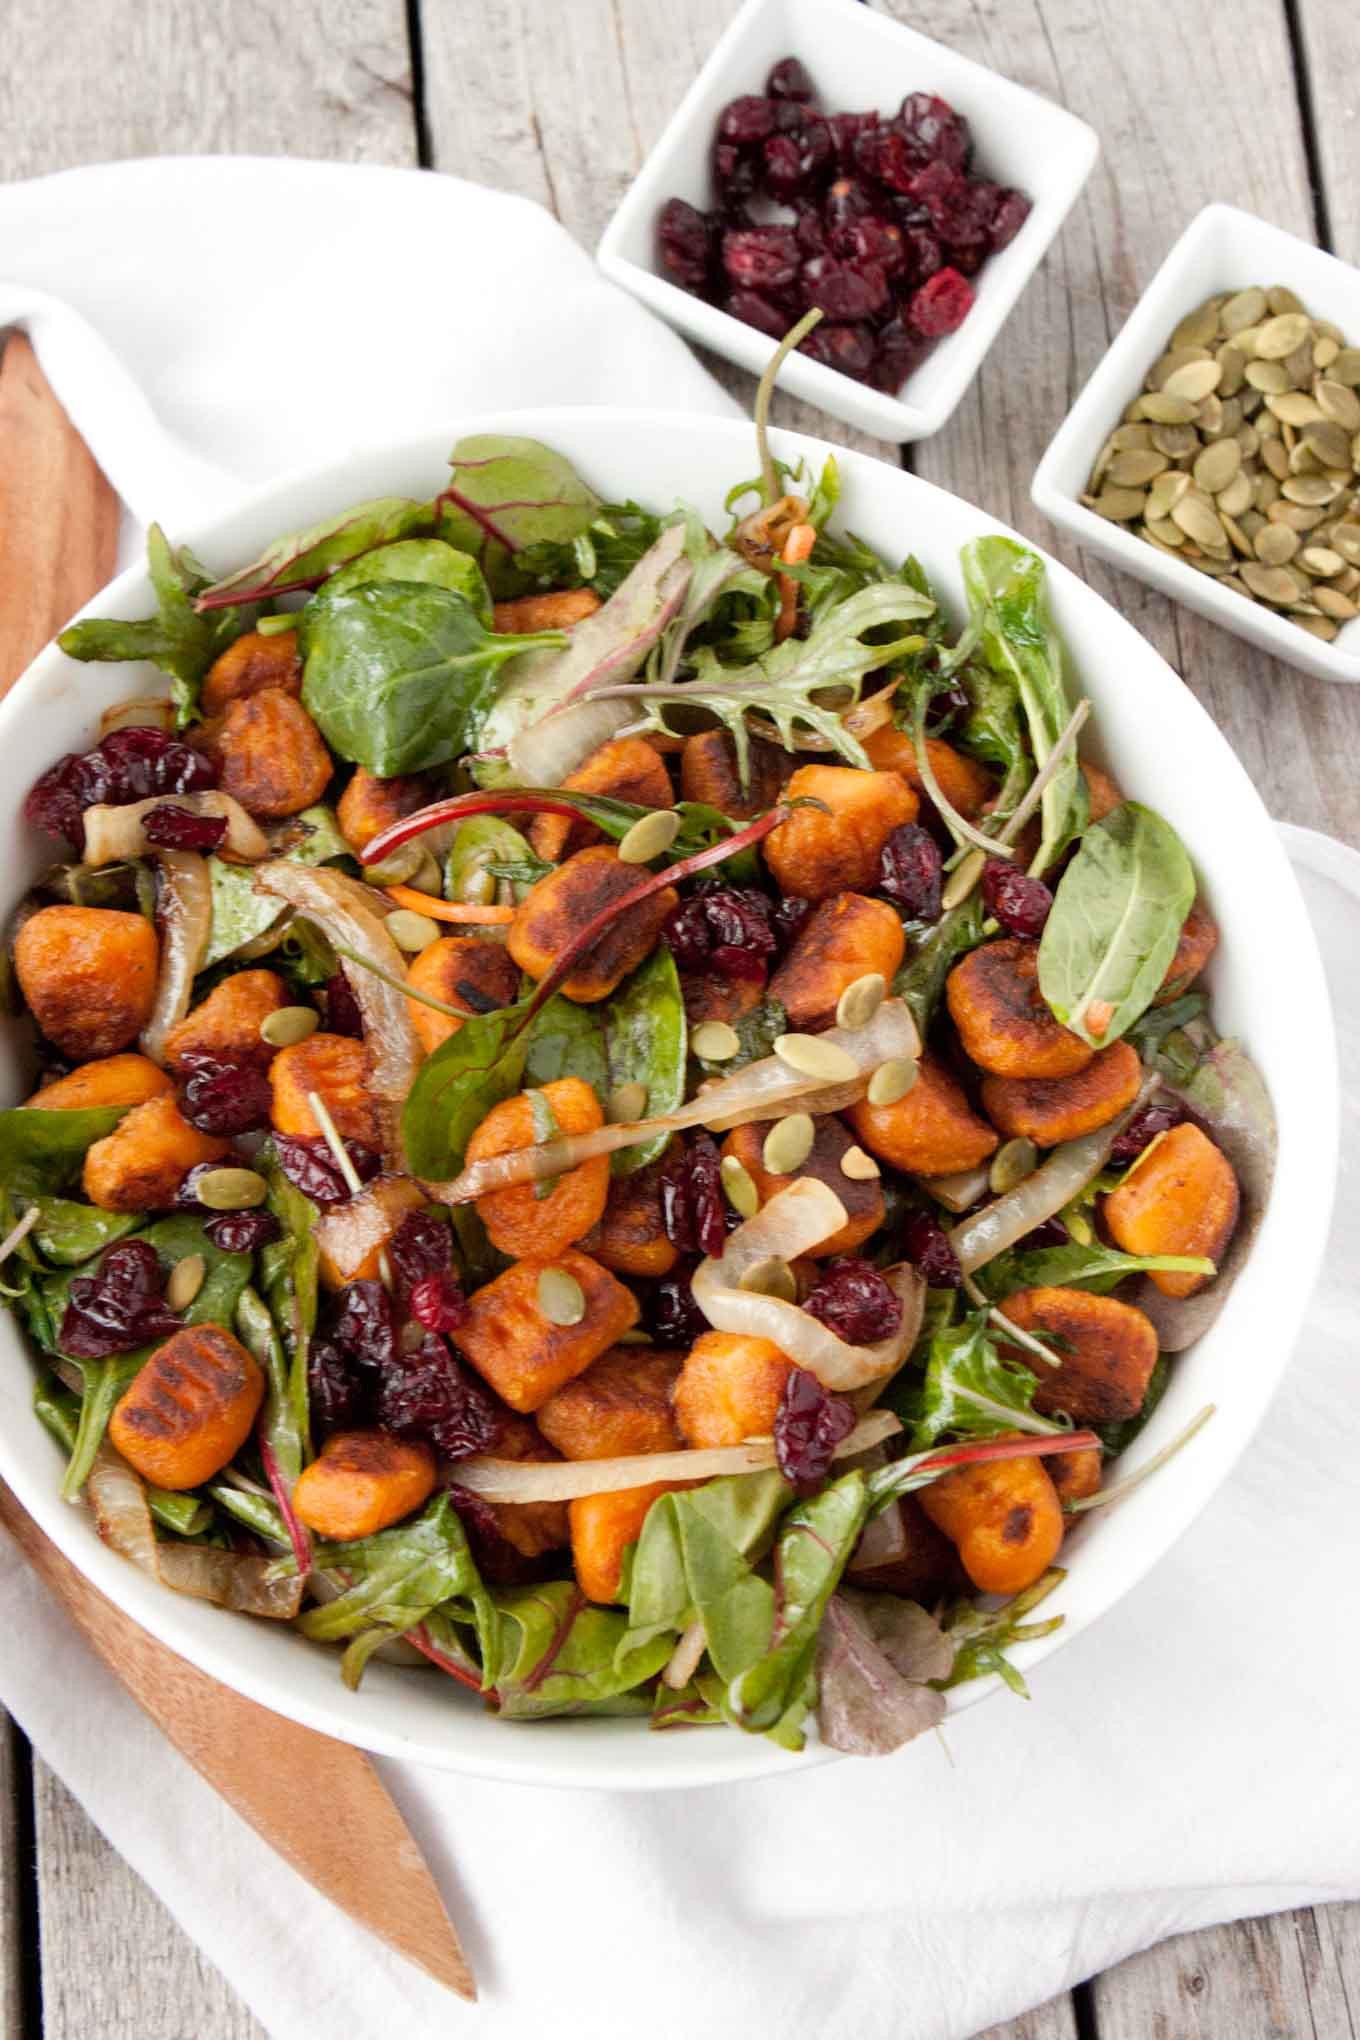 Healthy Winter Salads  Hearty Warm Winter Salad Recipes Healthy Eaton